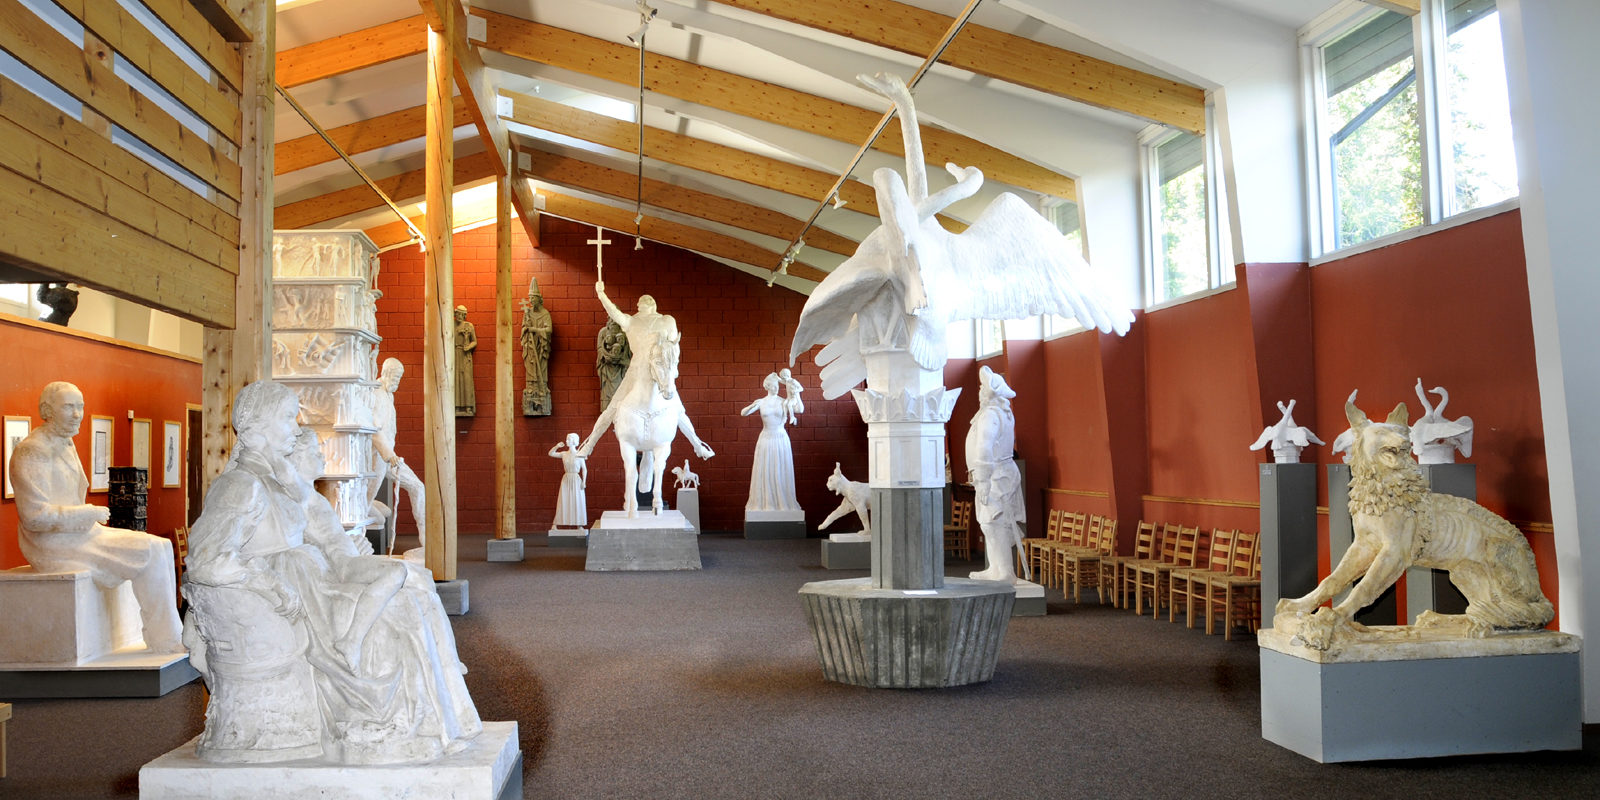 Dyre Vaa-samlingane i Rauland med sitt store, katedral-liknande hovudutstillingsrom. Foto: Leif Jamtveit